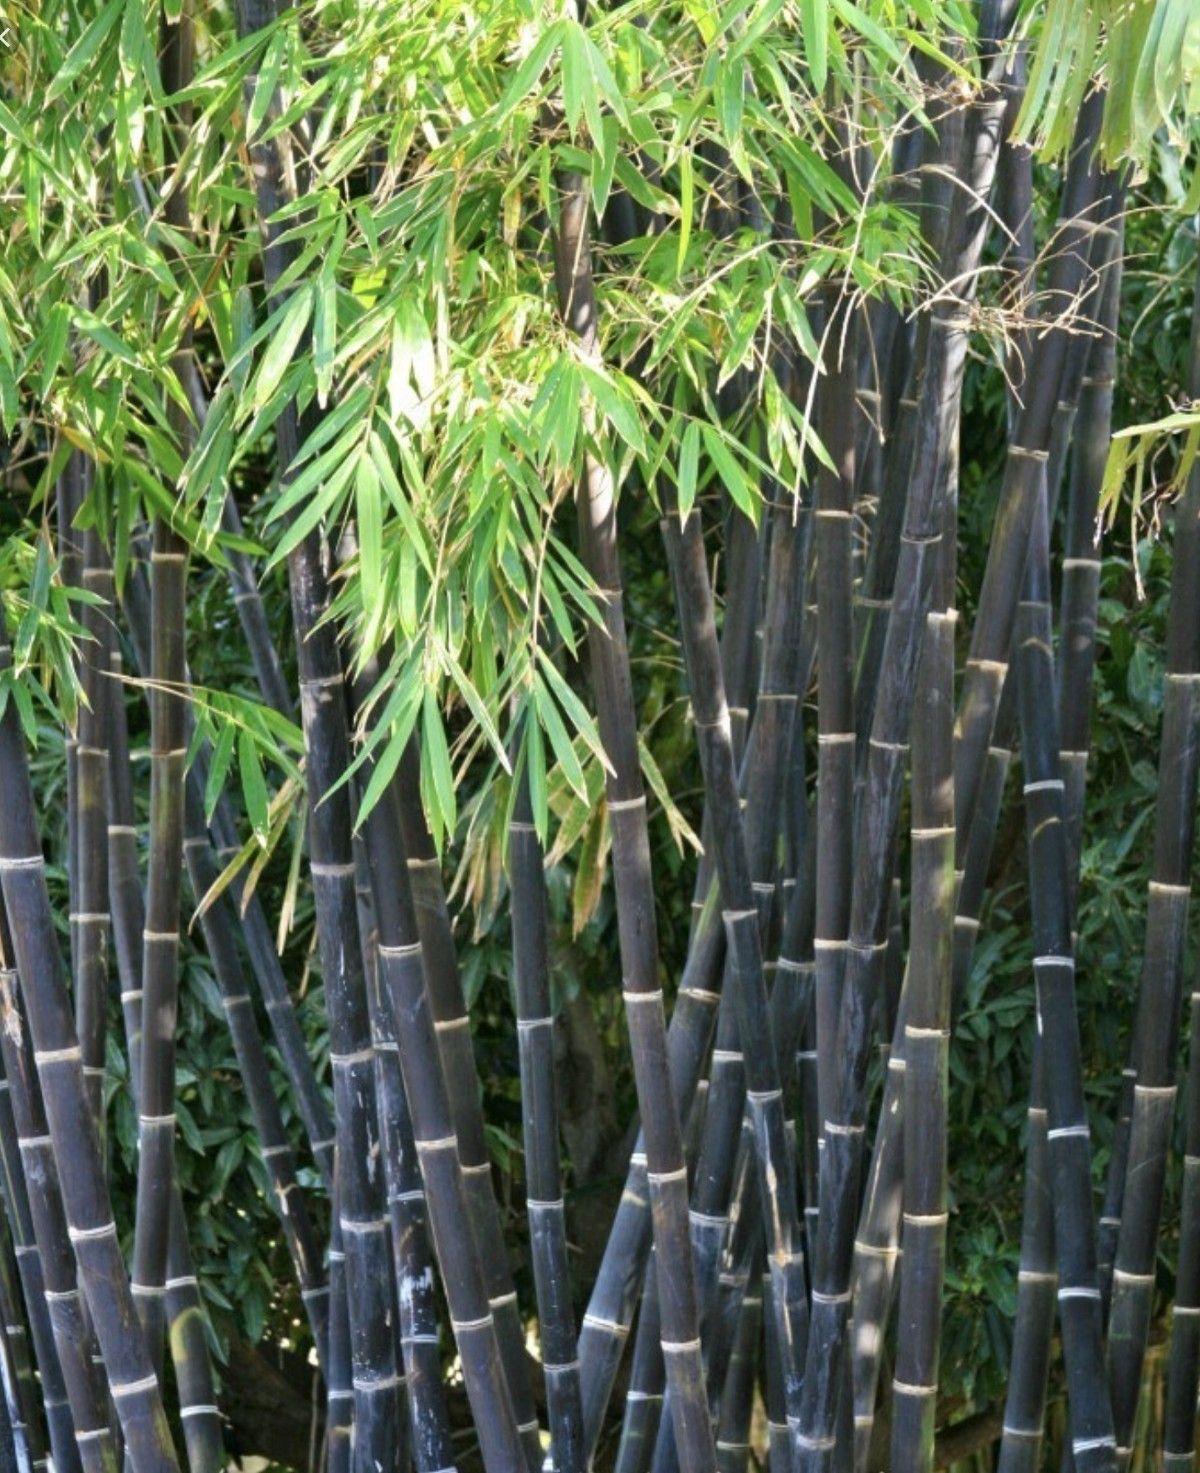 Bamboo Grove Bamboo Plants Bamboo Garden Bamboo Landscape